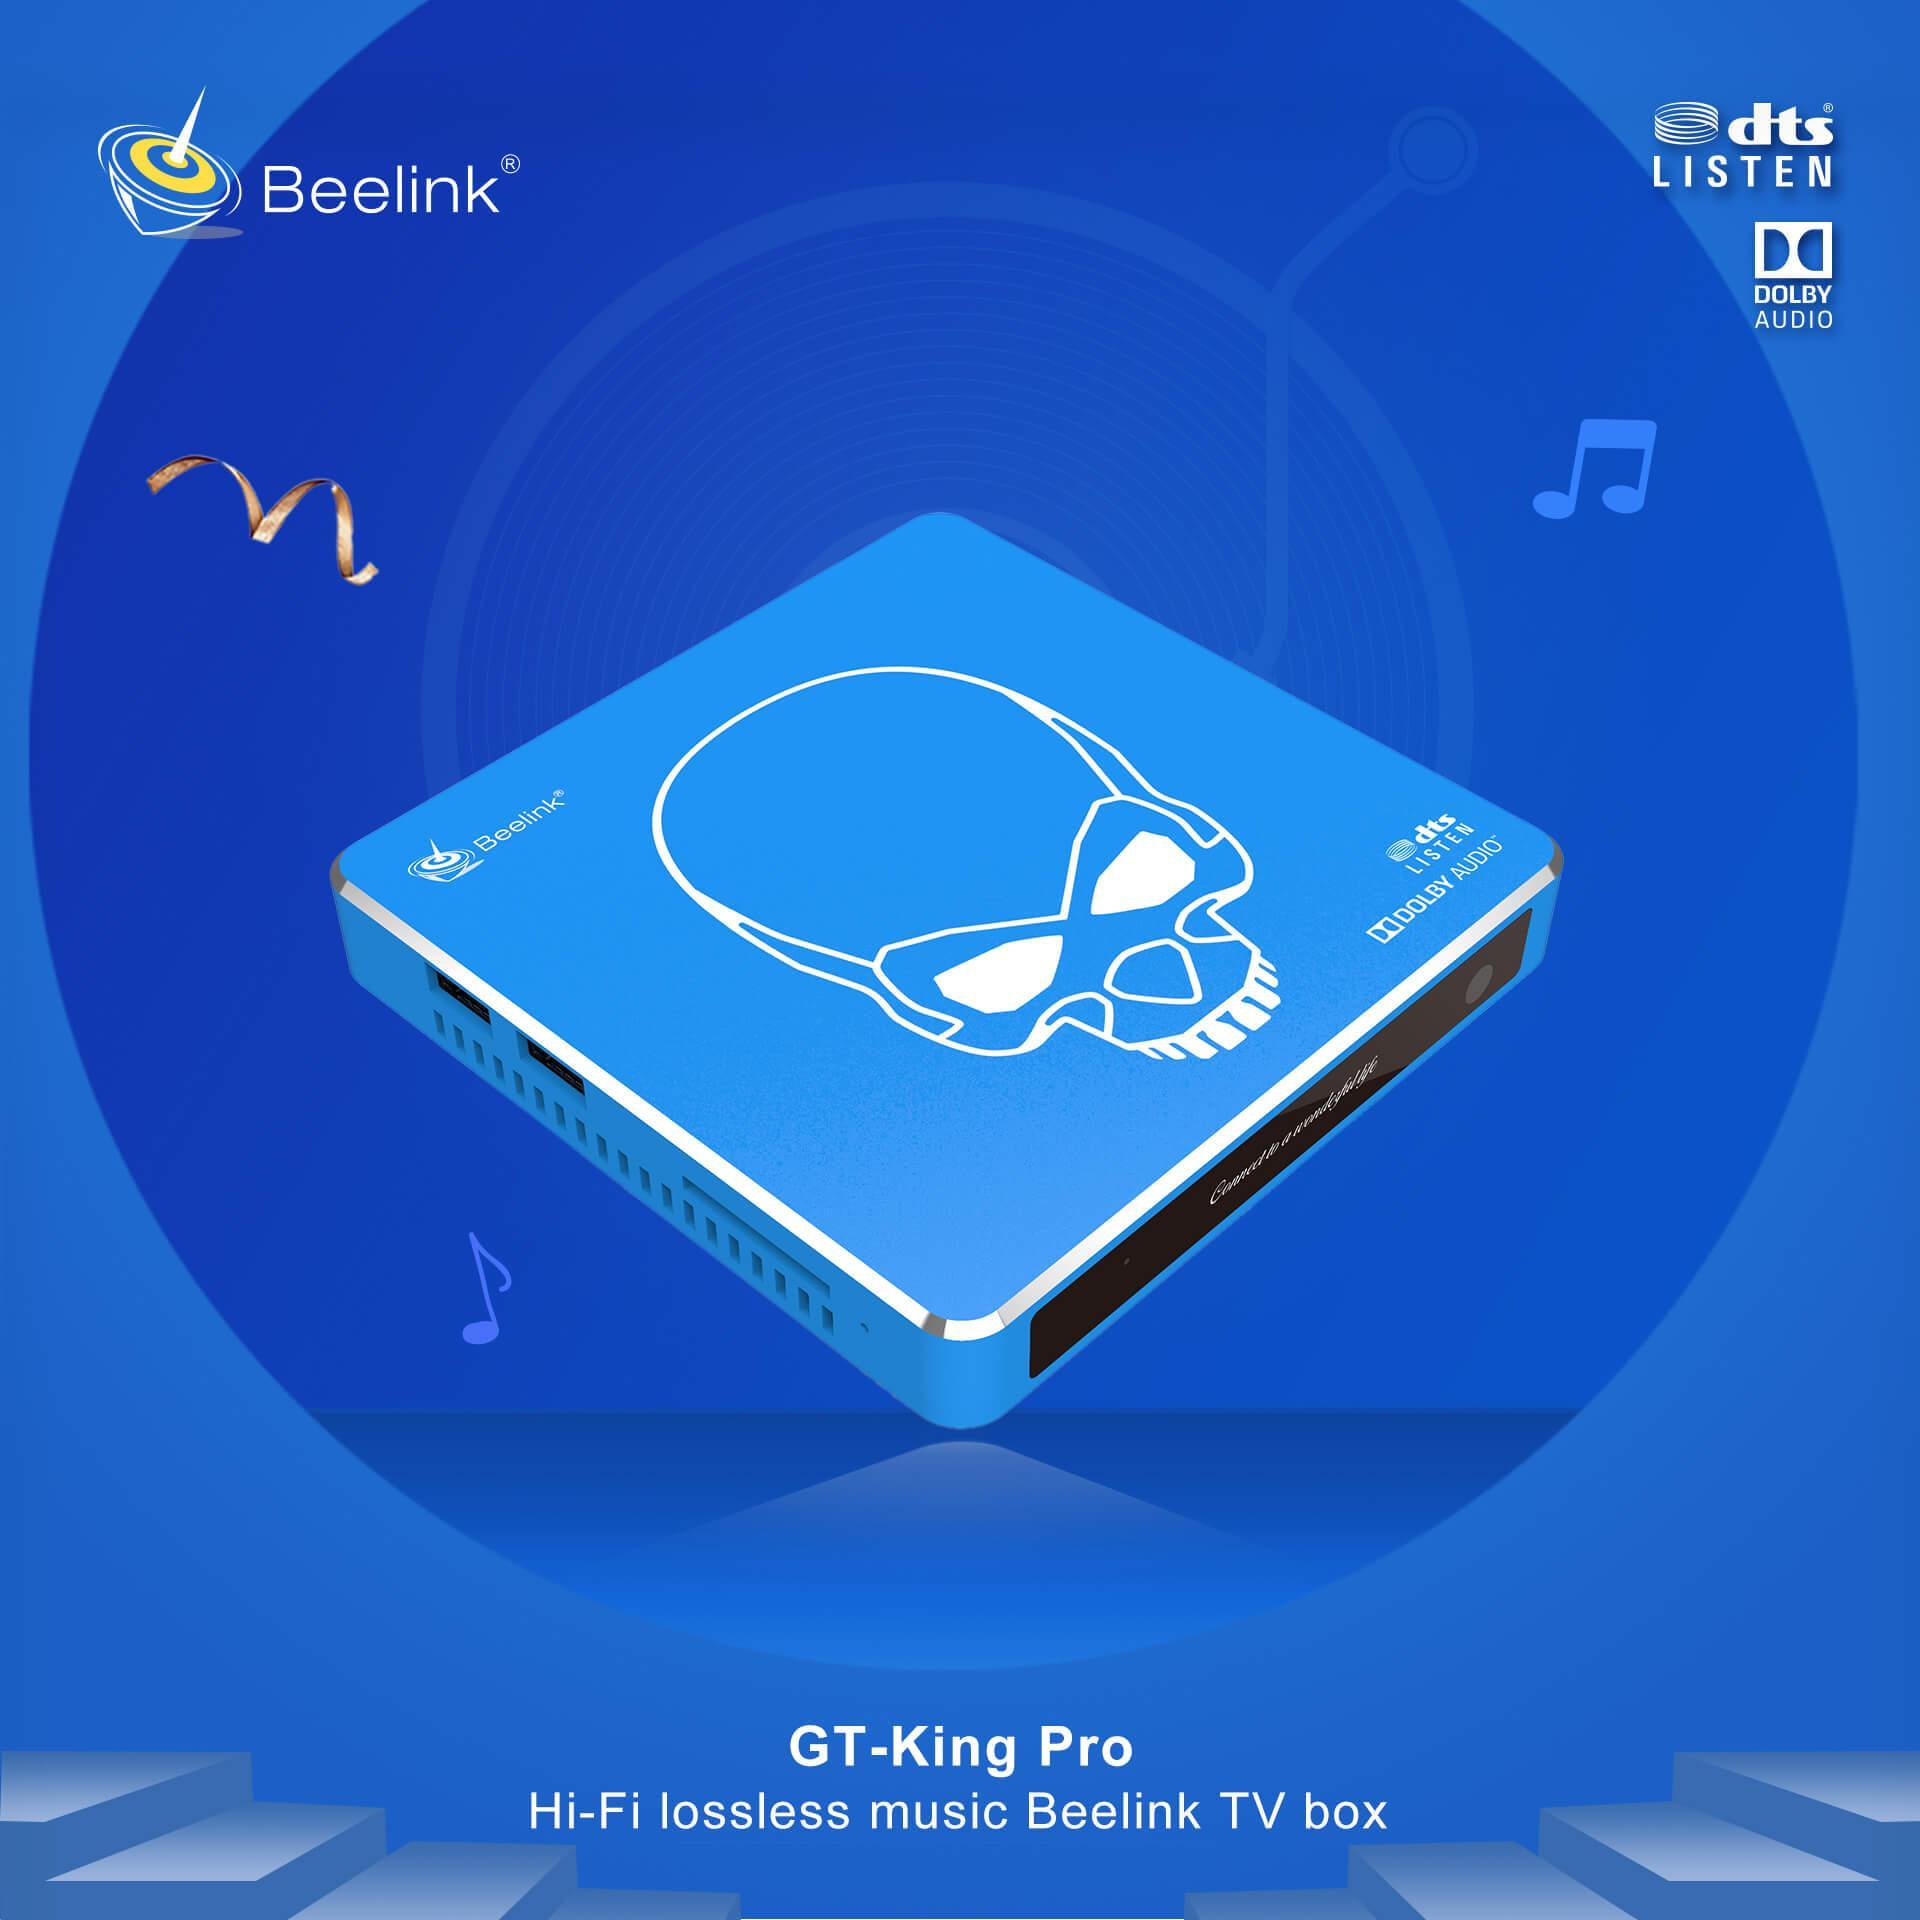 اندروید باکس Beelink GT King Pro